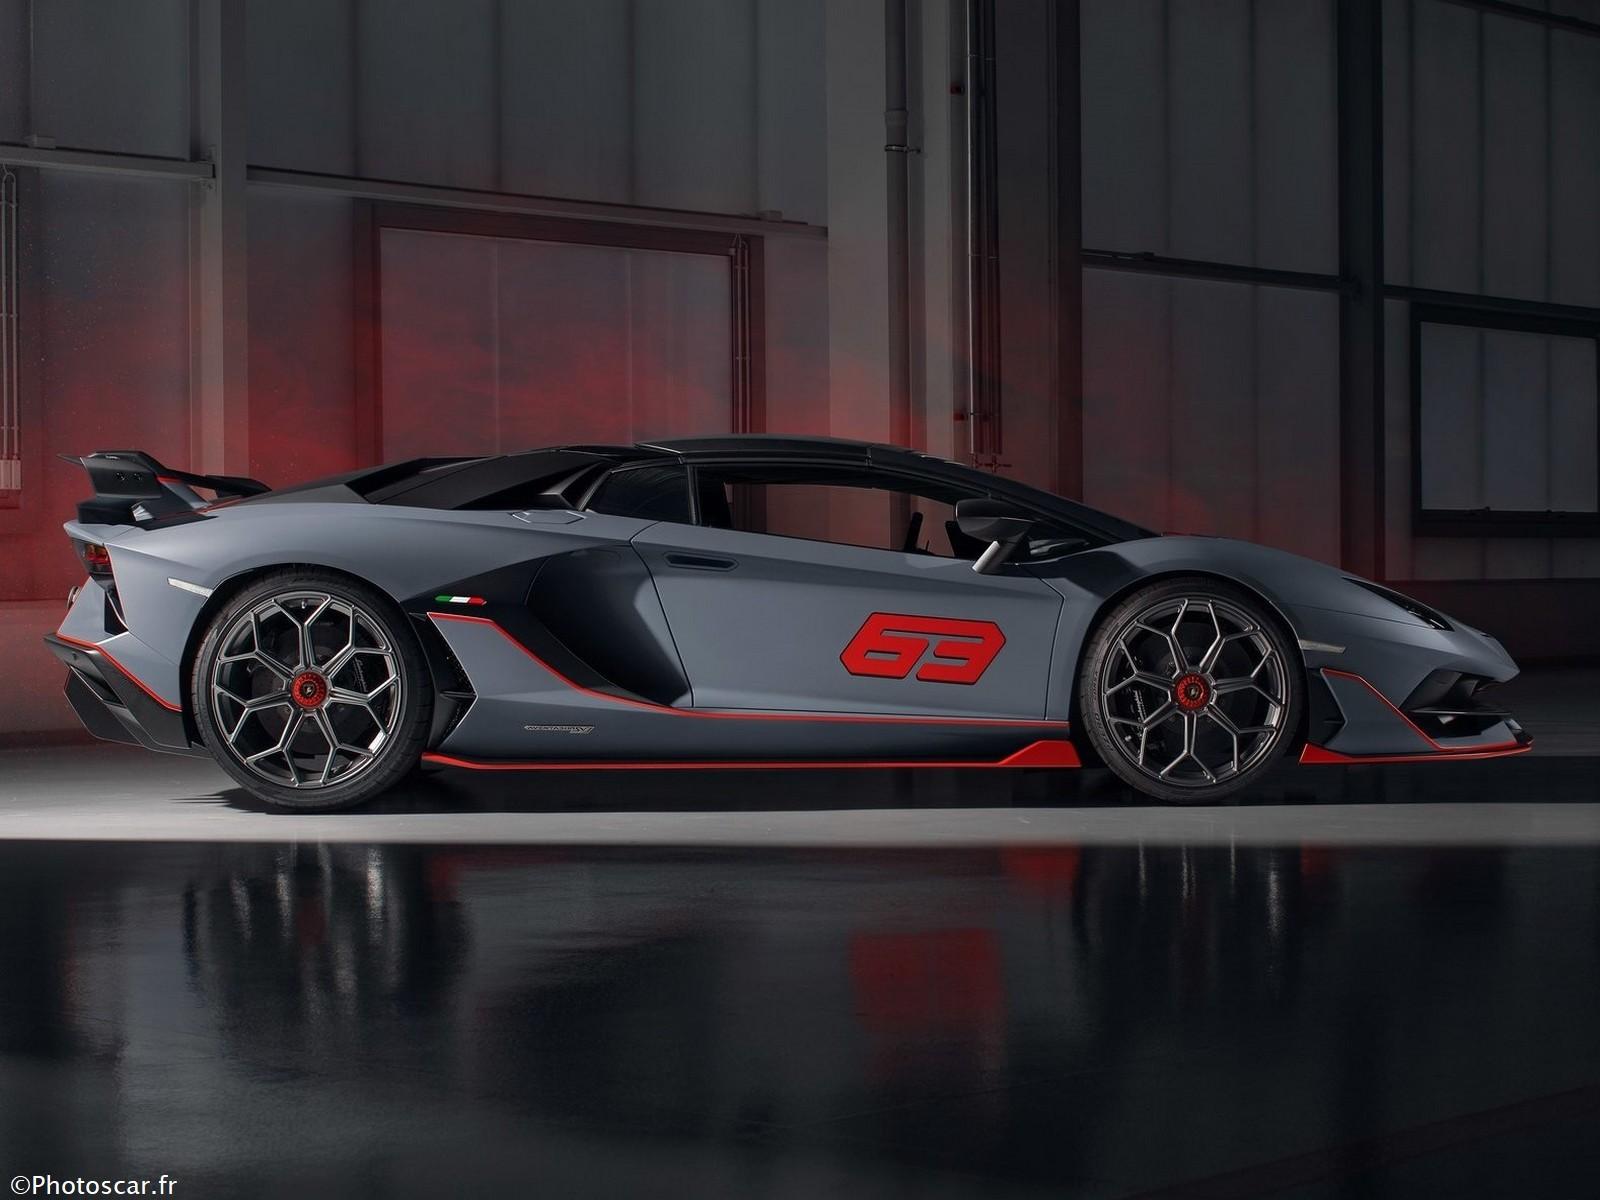 Lamborghini Aventador SVJ 63 Roadster 2020